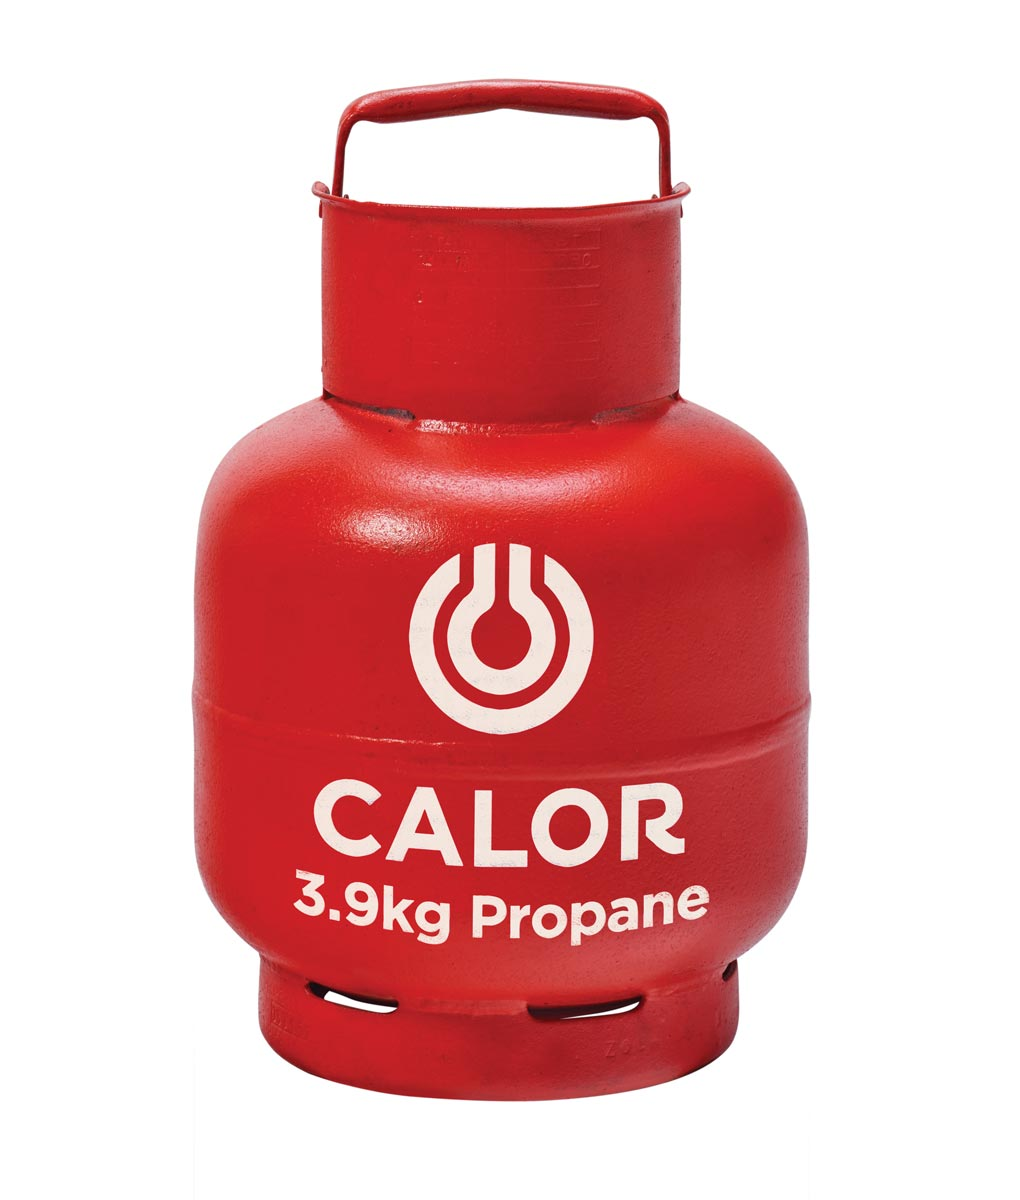 Calor Gas 3.9kg Propane Bottle Refill from BBQ Gas Bottles